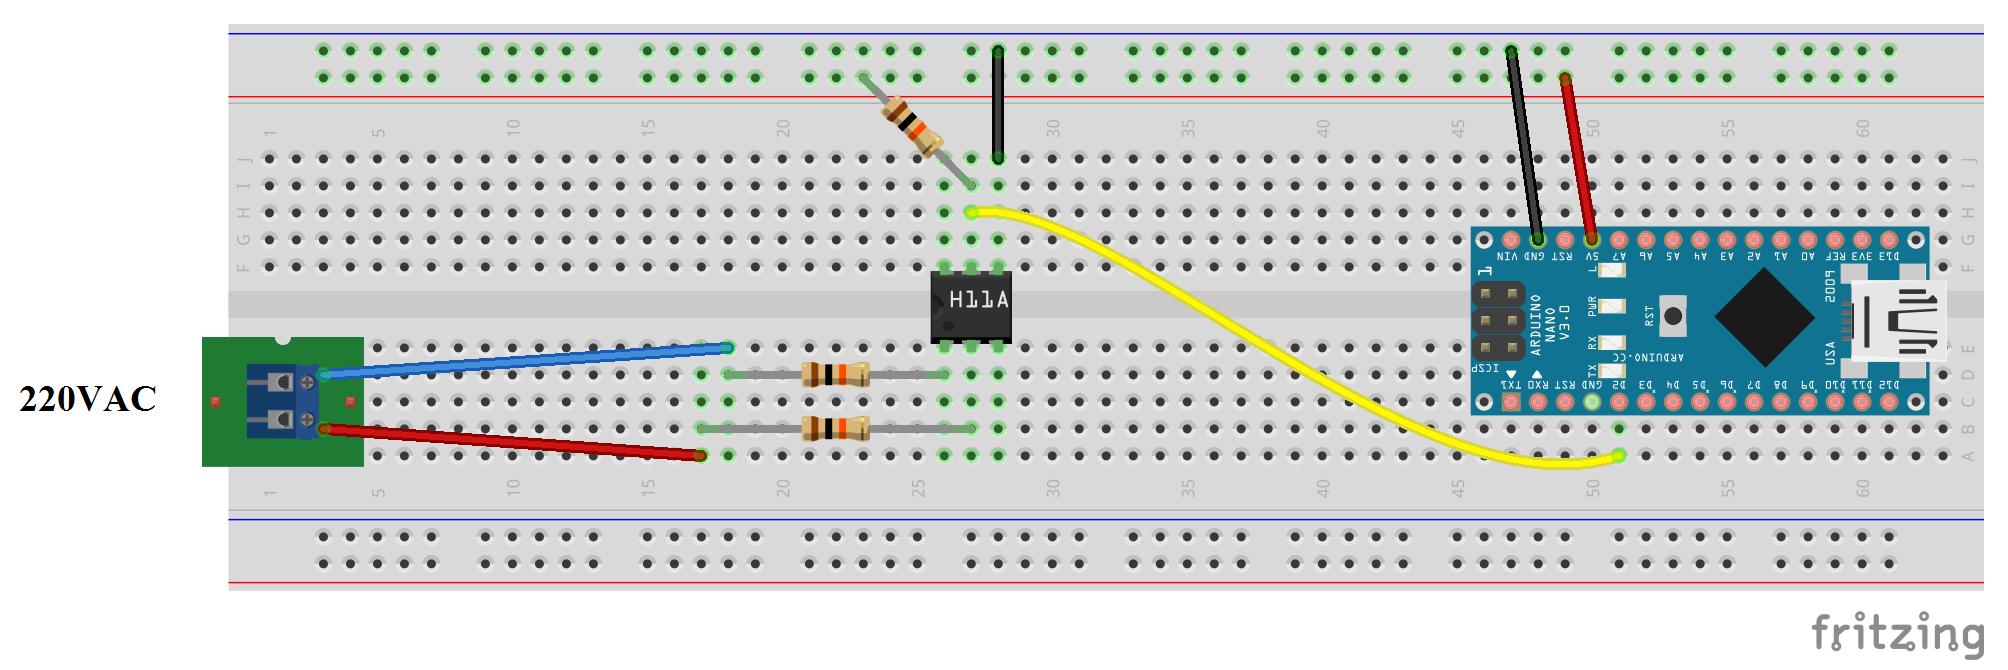 esquema protoboard